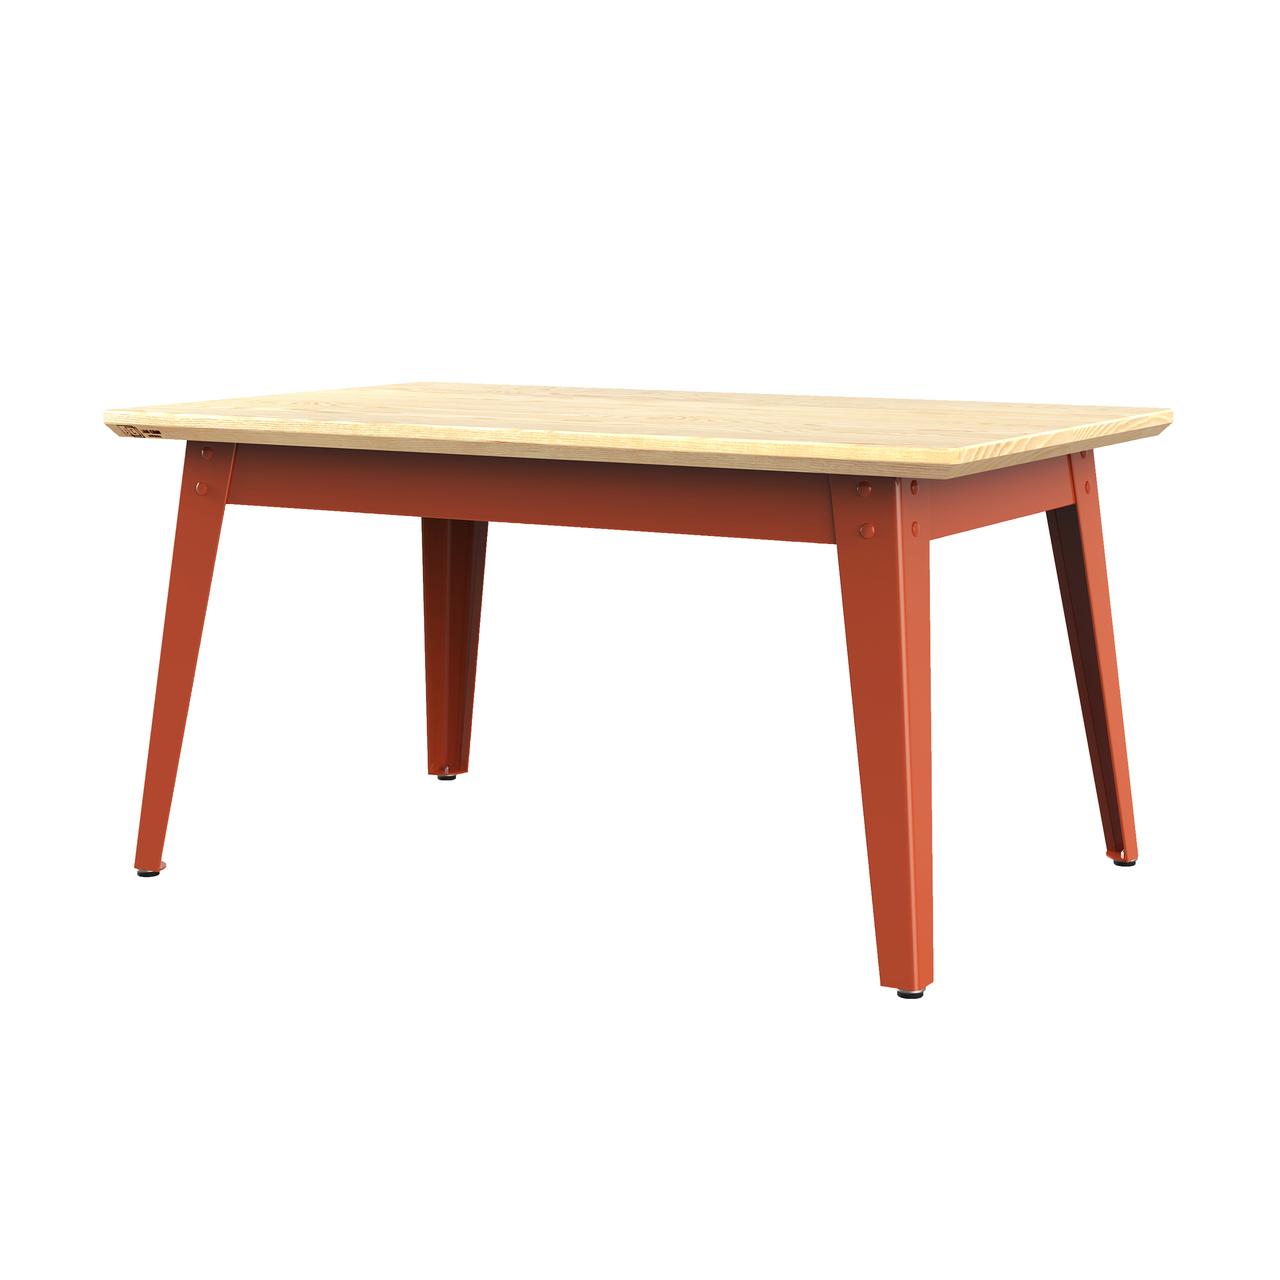 Jan Cray 6Grad Couchtisch Holz Rotorange, Eschenholz geölt, B: 55 cm / L: 90 cm / H: 46 cm